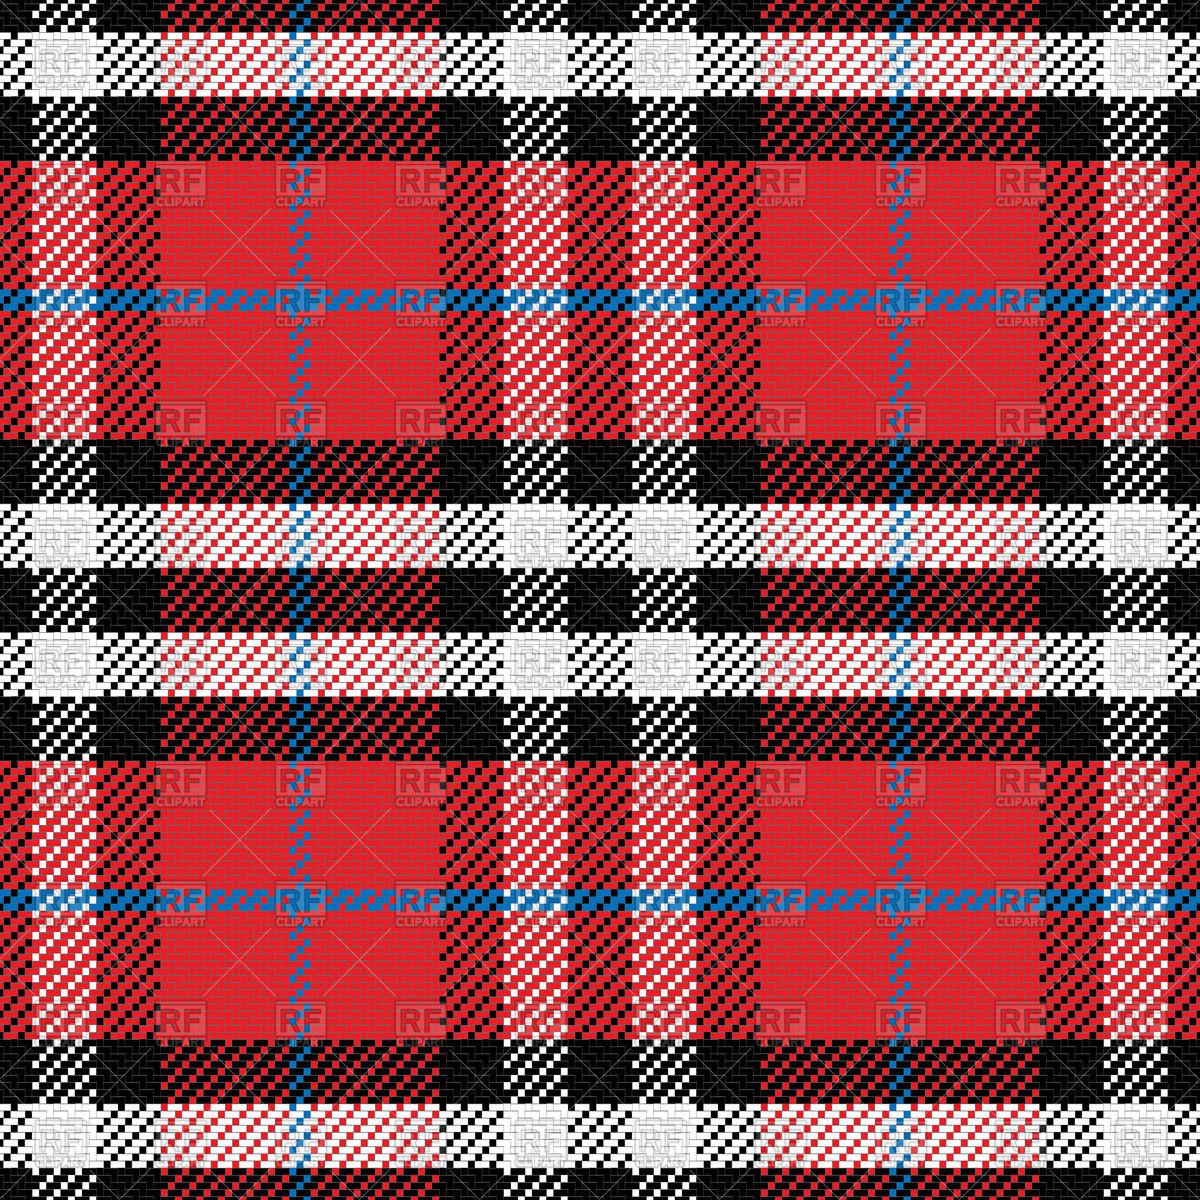 Scottish tartan pattern Vector Image #43720.